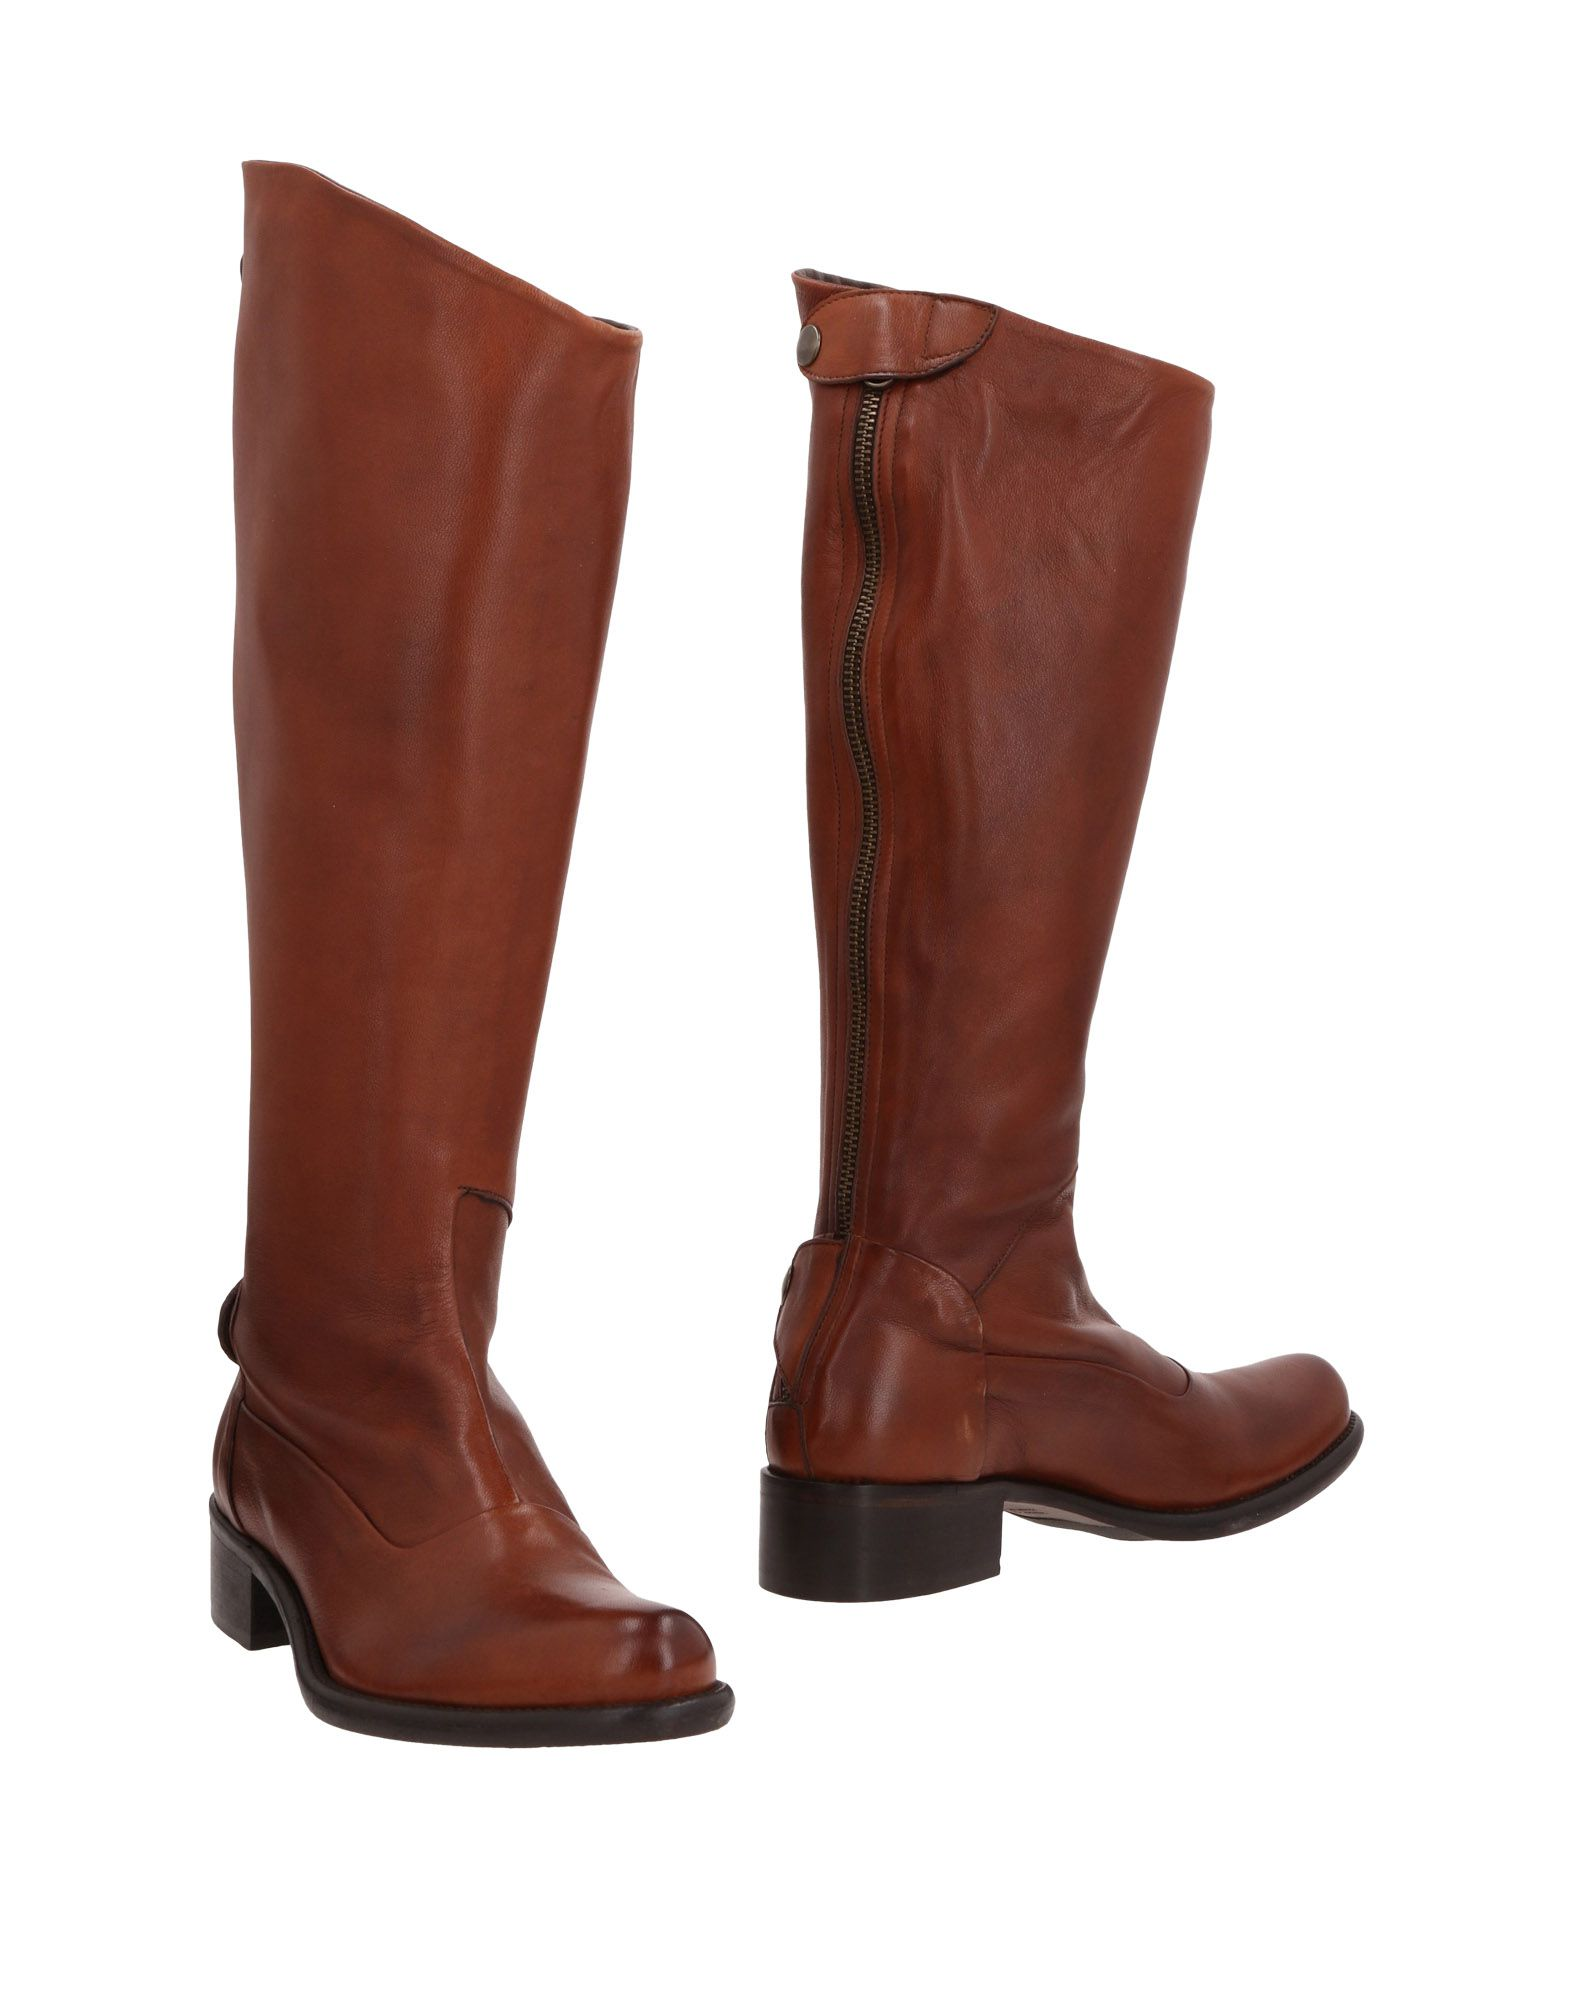 Mally Stiefel Damen   Damen 11476270LL Heiße Schuhe 3933ed